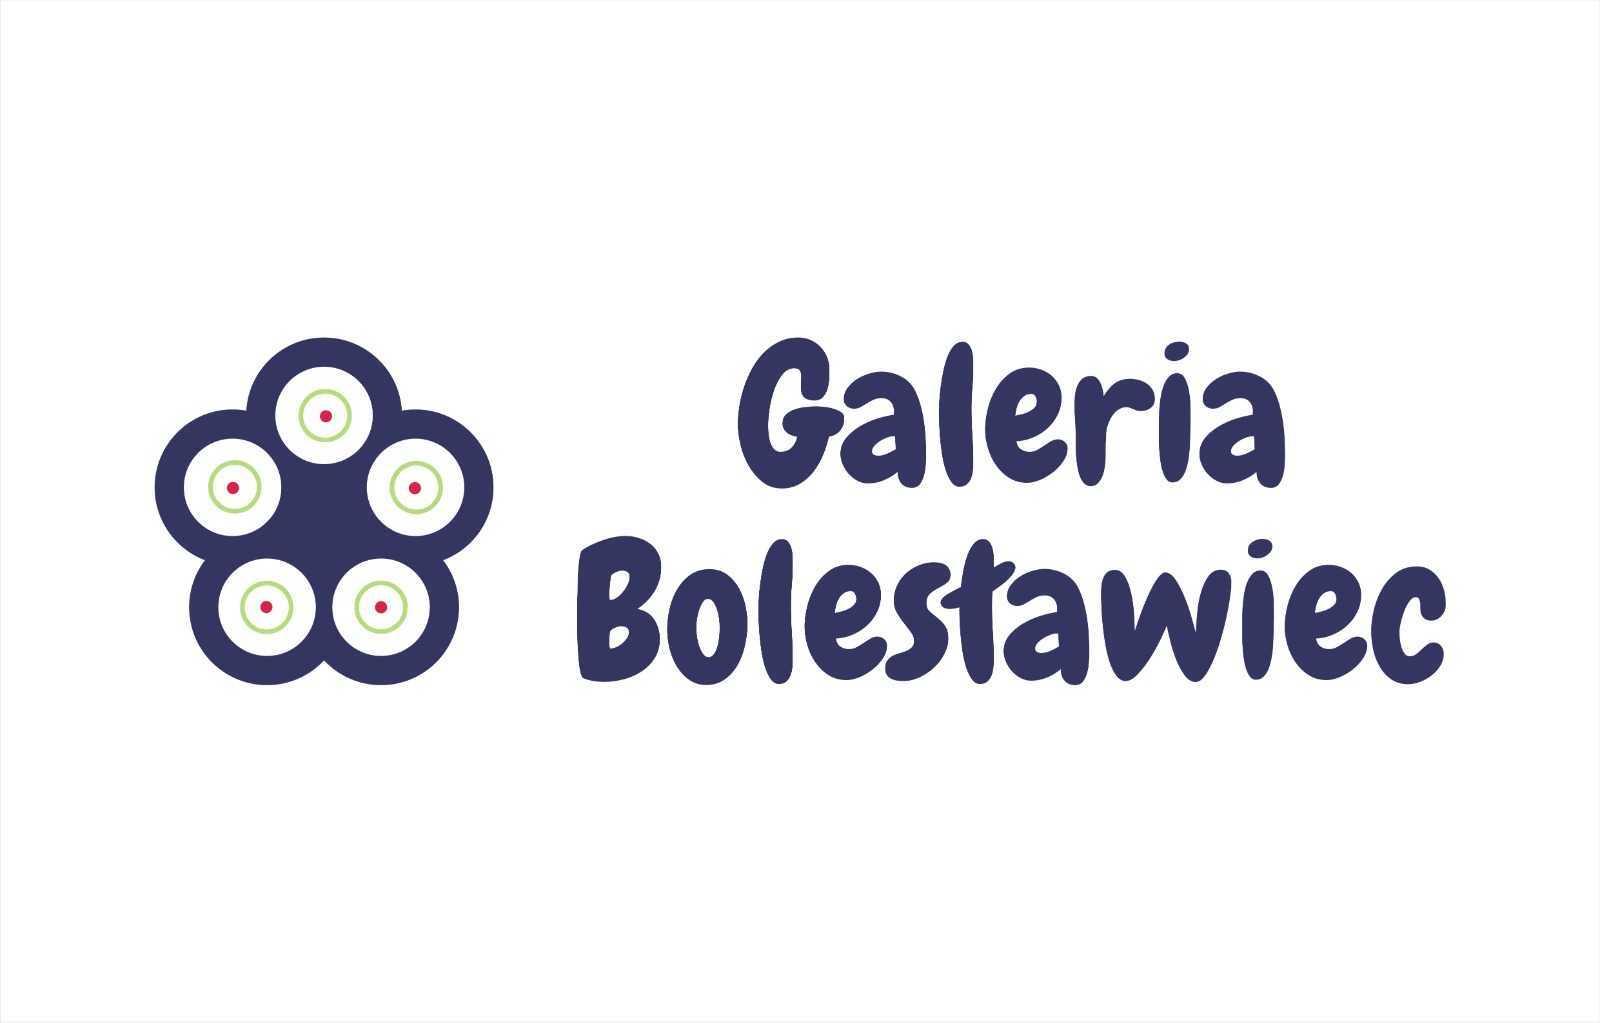 Galeria Bolesławiec